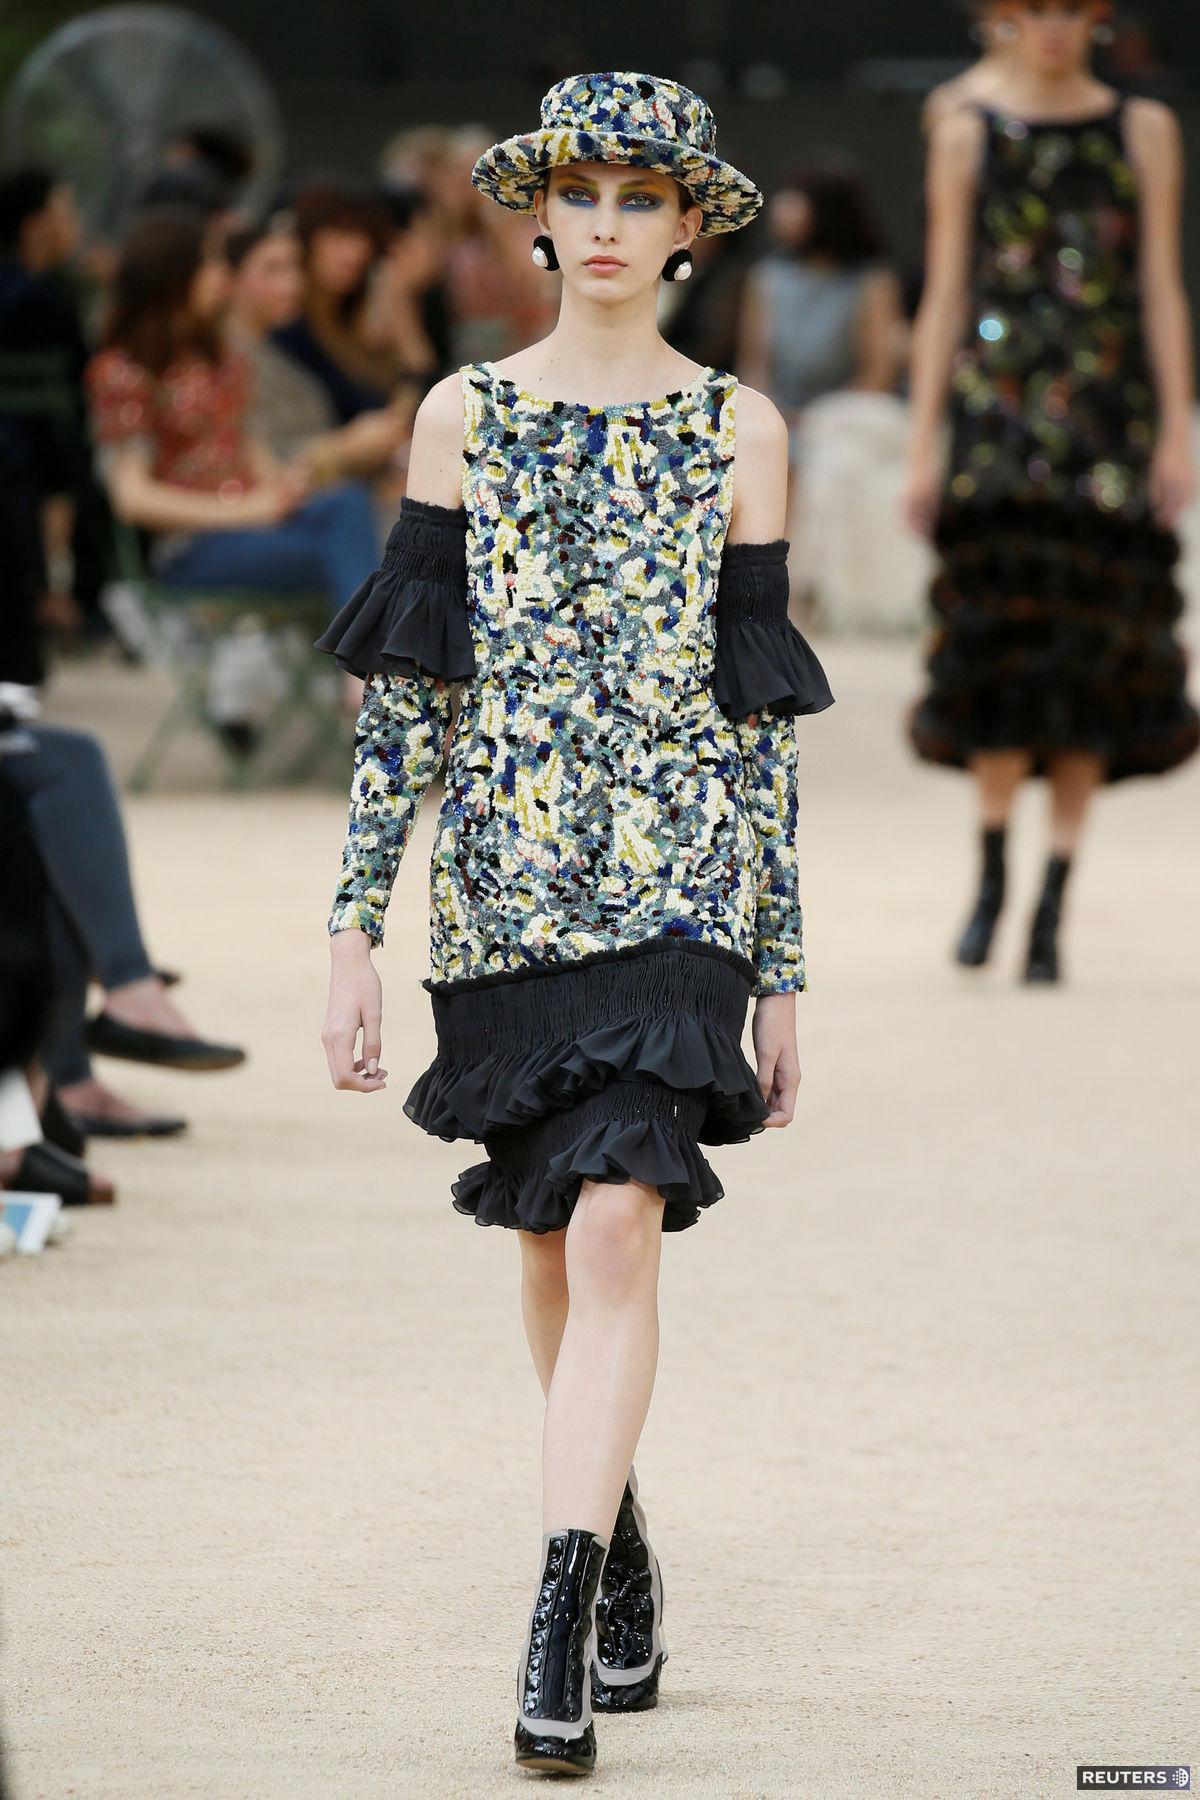 4767cc35b112 Úchvatná móda couture ovládla Paríž  Dych vyrazil luxus aj hodiny ...